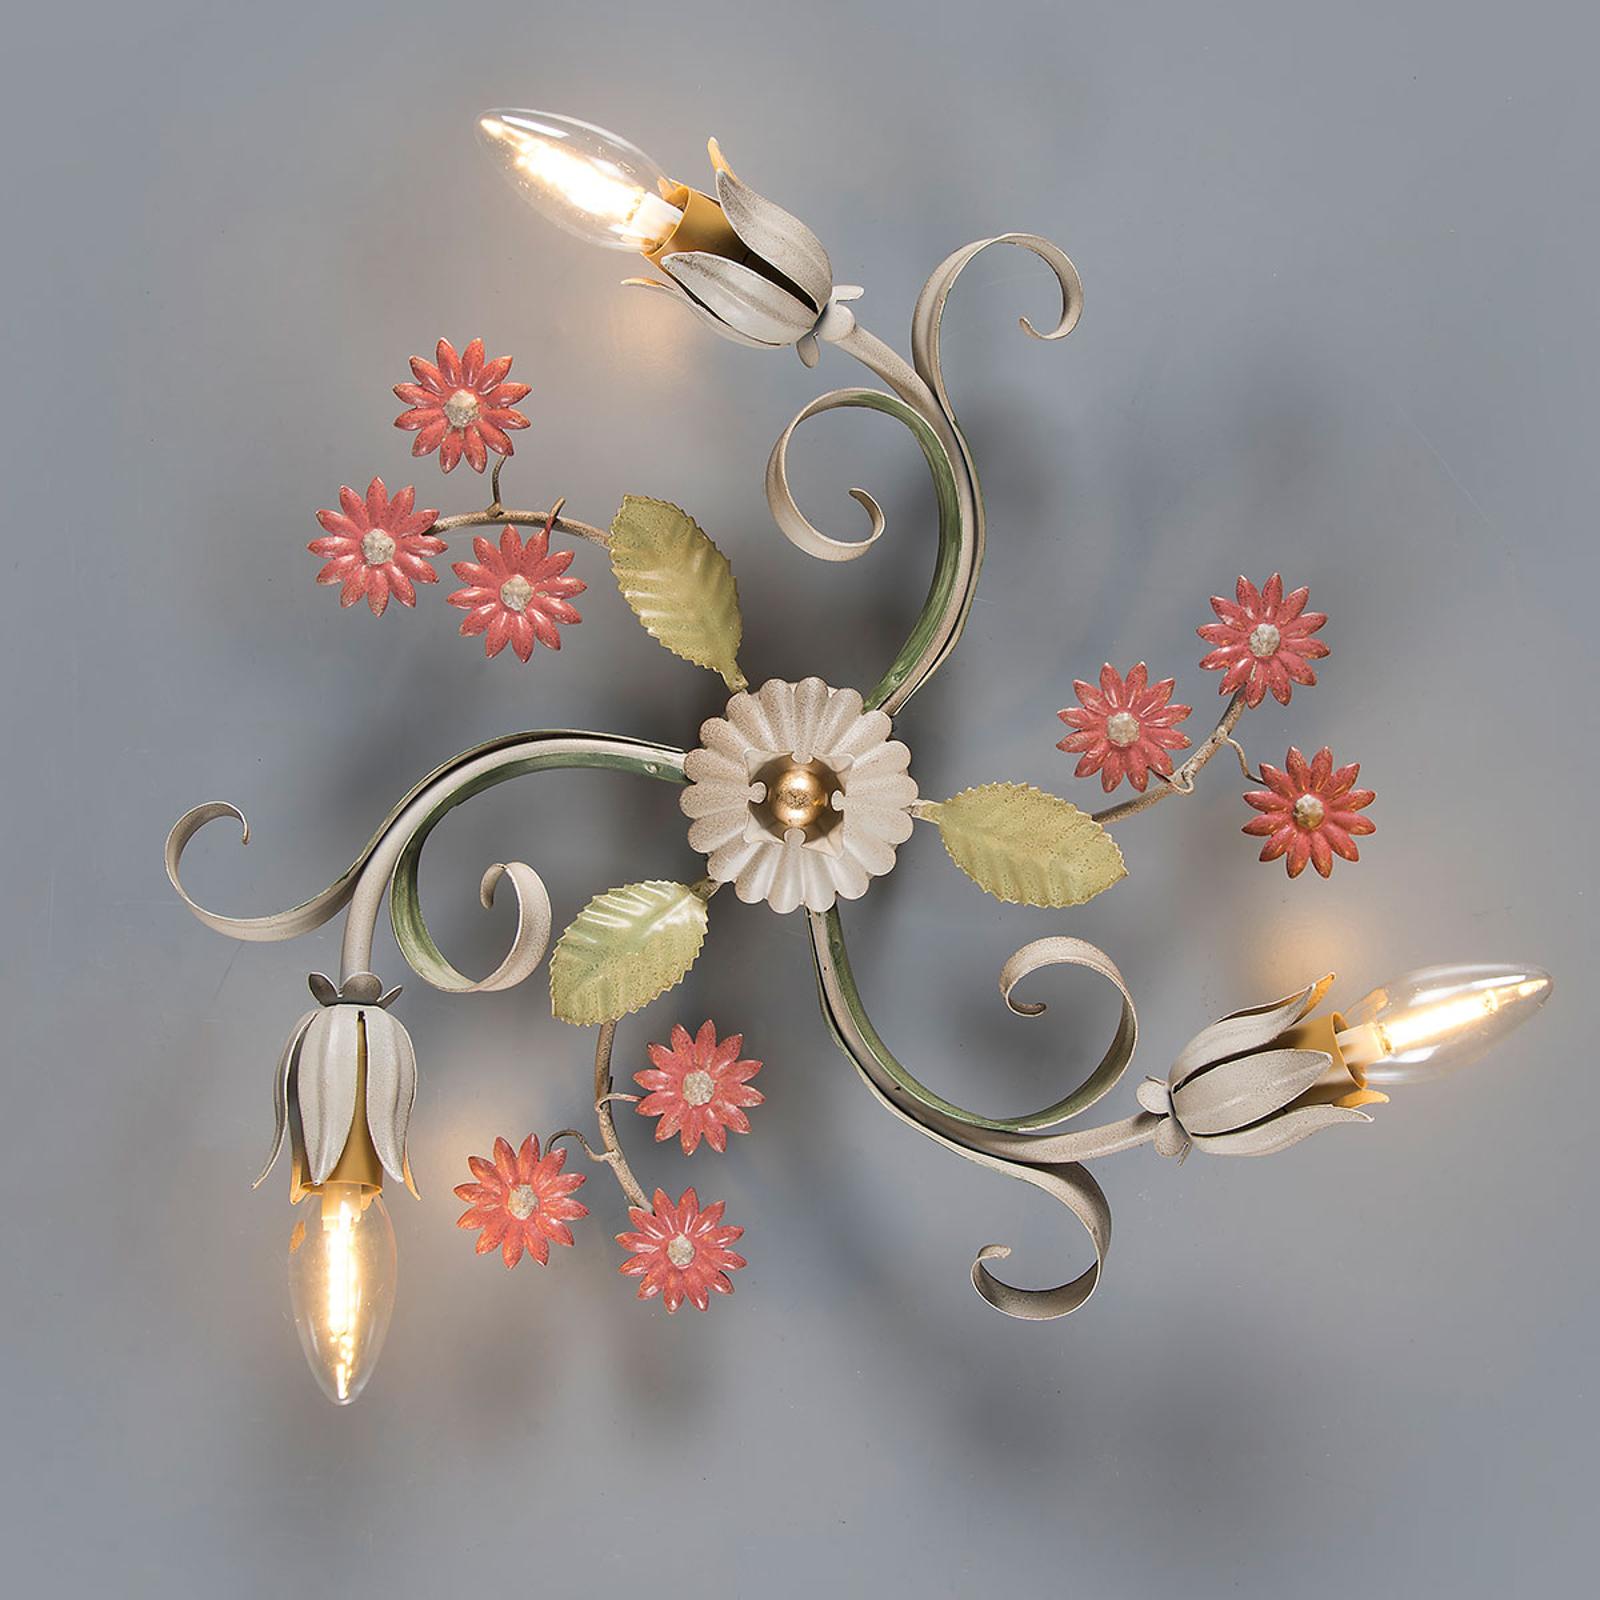 3-punktowa florencka Lampa sufitowa Toscana